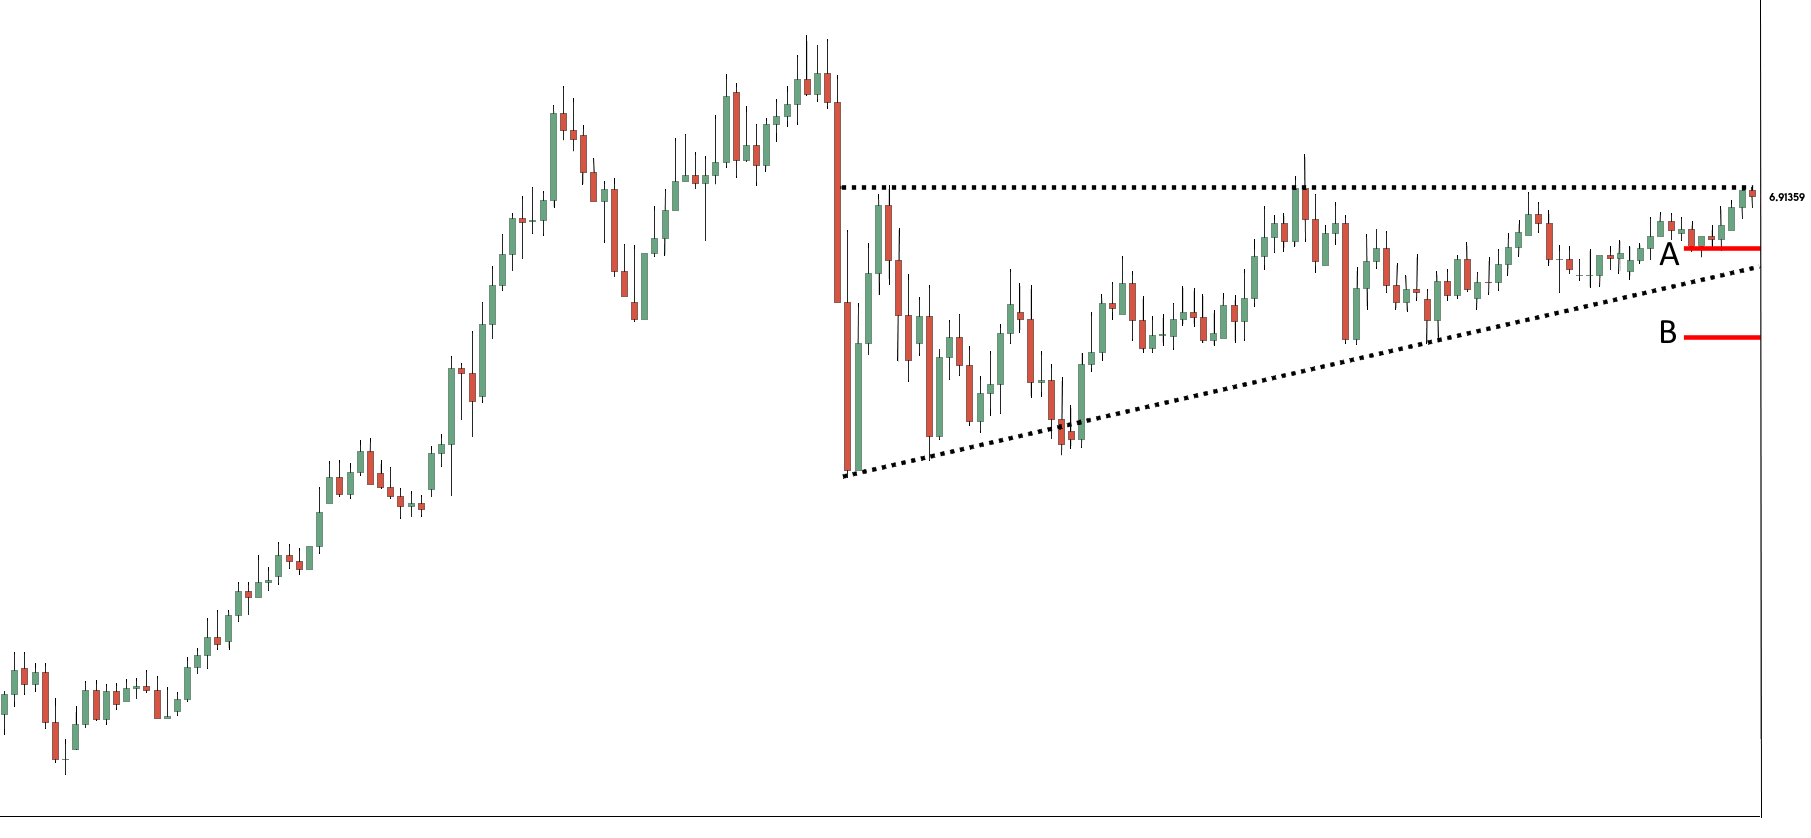 Ascending Triangle Pattern Chart Sample 5 - Finance Brokerage